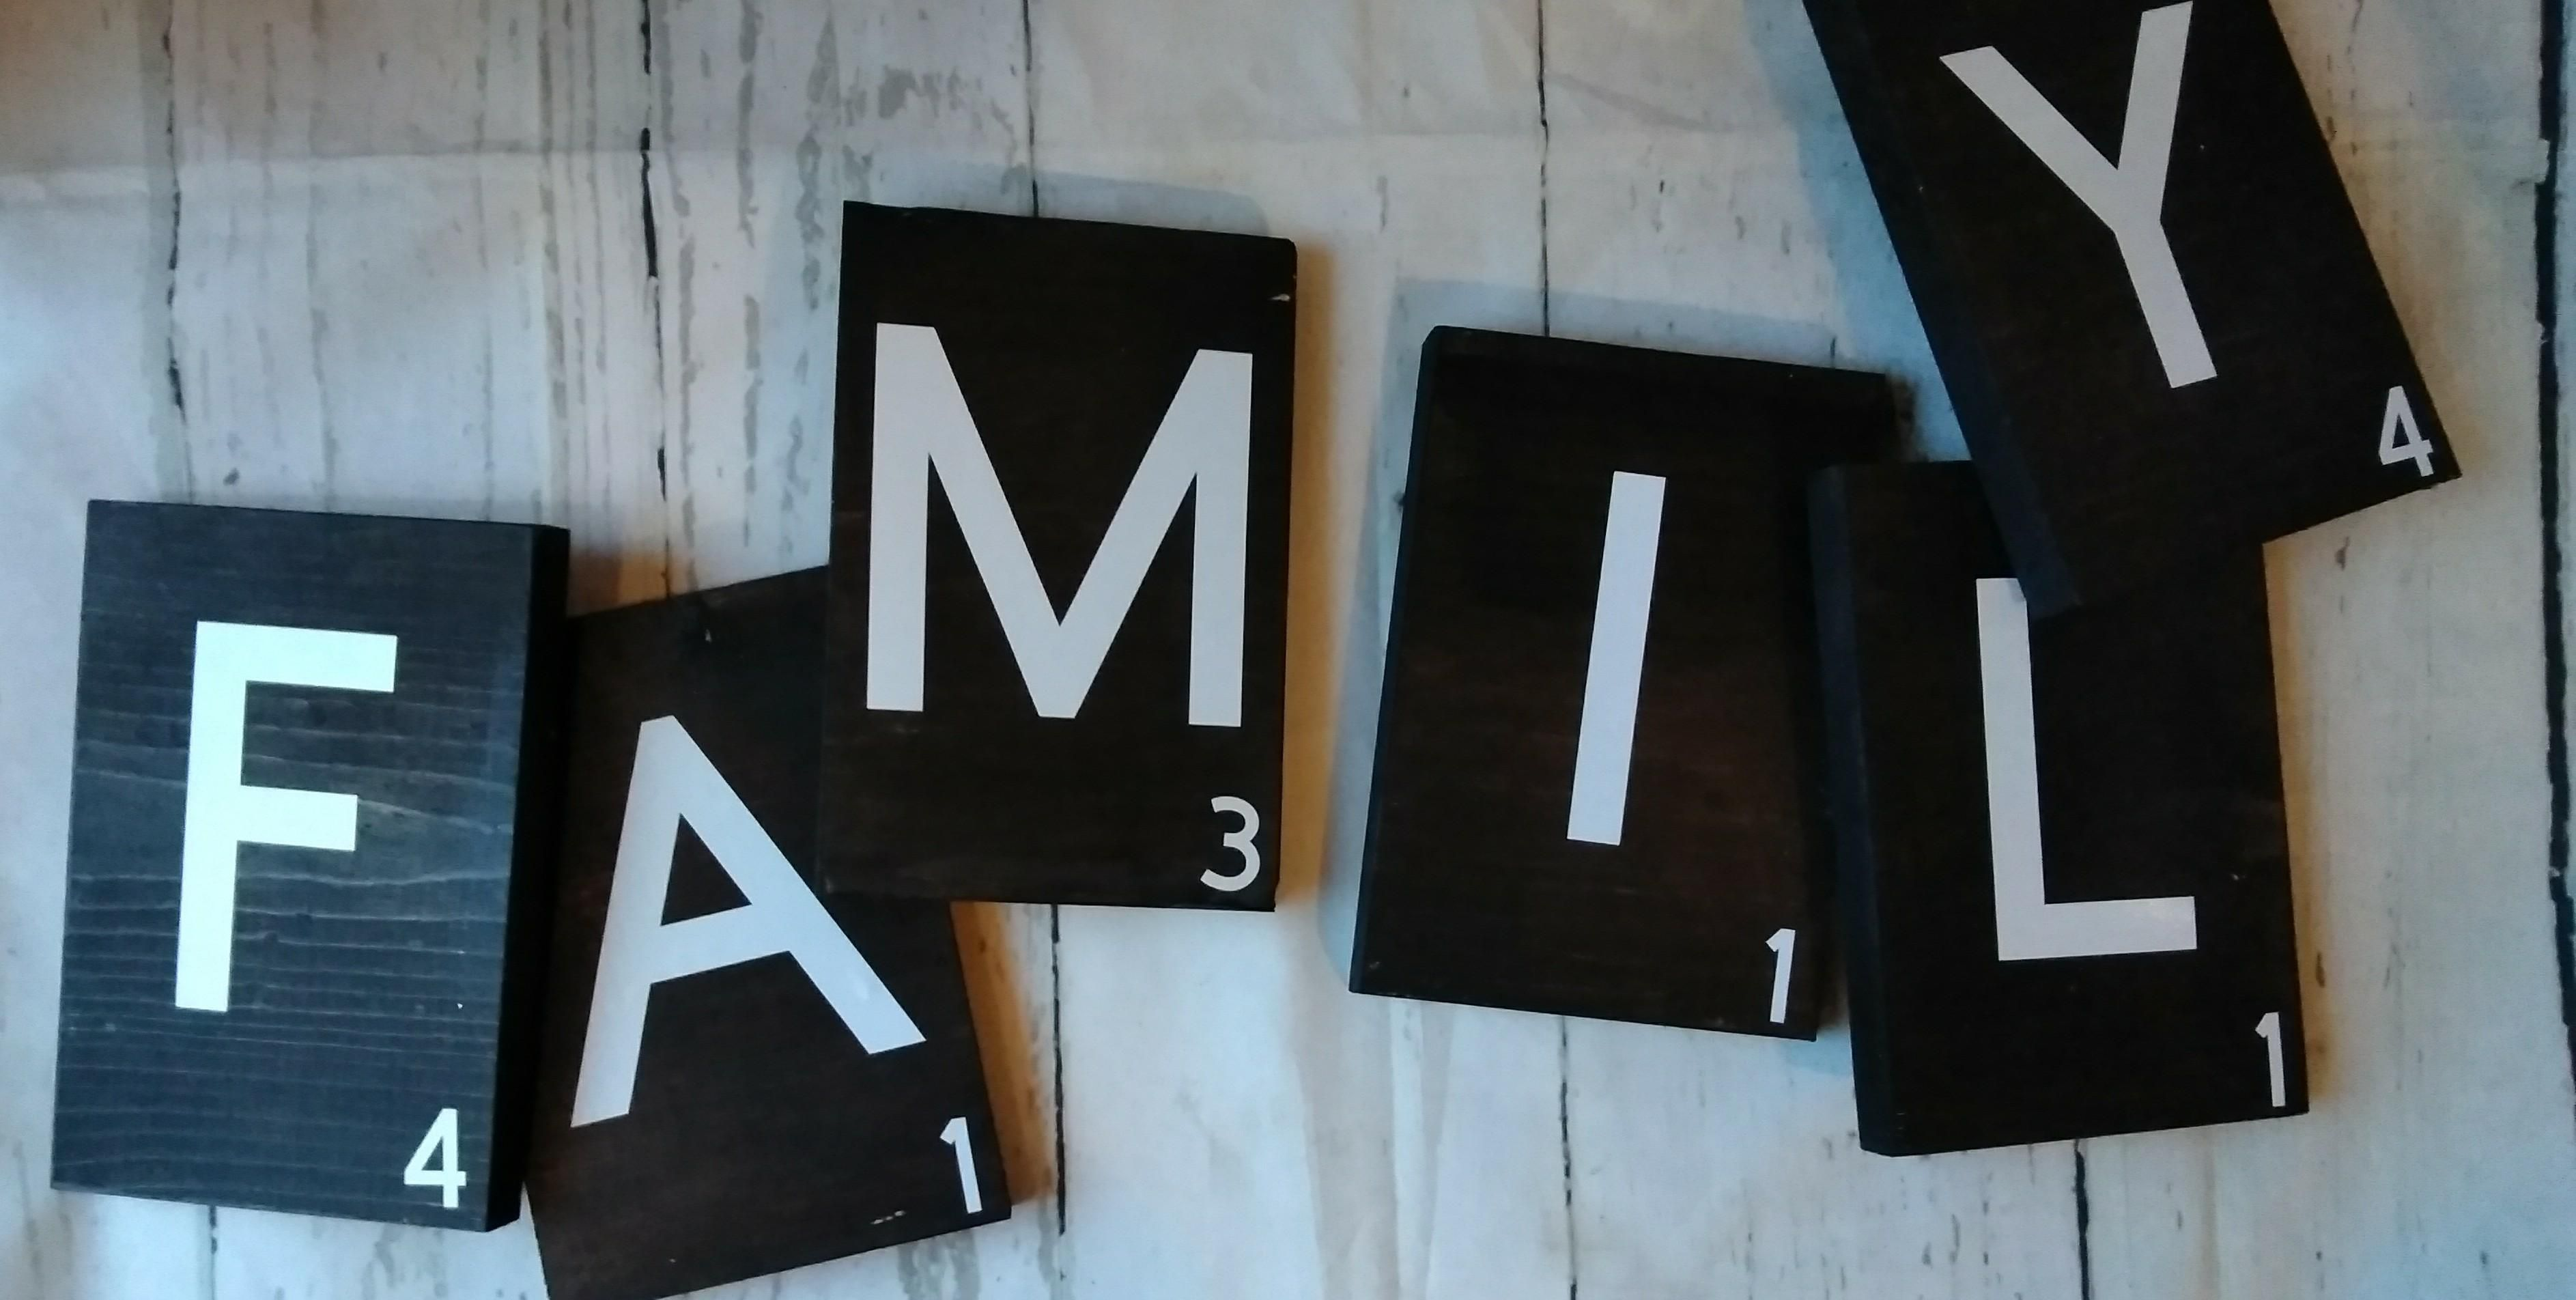 Family Scrabble Tiles In Black And White Scrabble Tile Wall Art Scrabble Tiles Wall Staining Wood